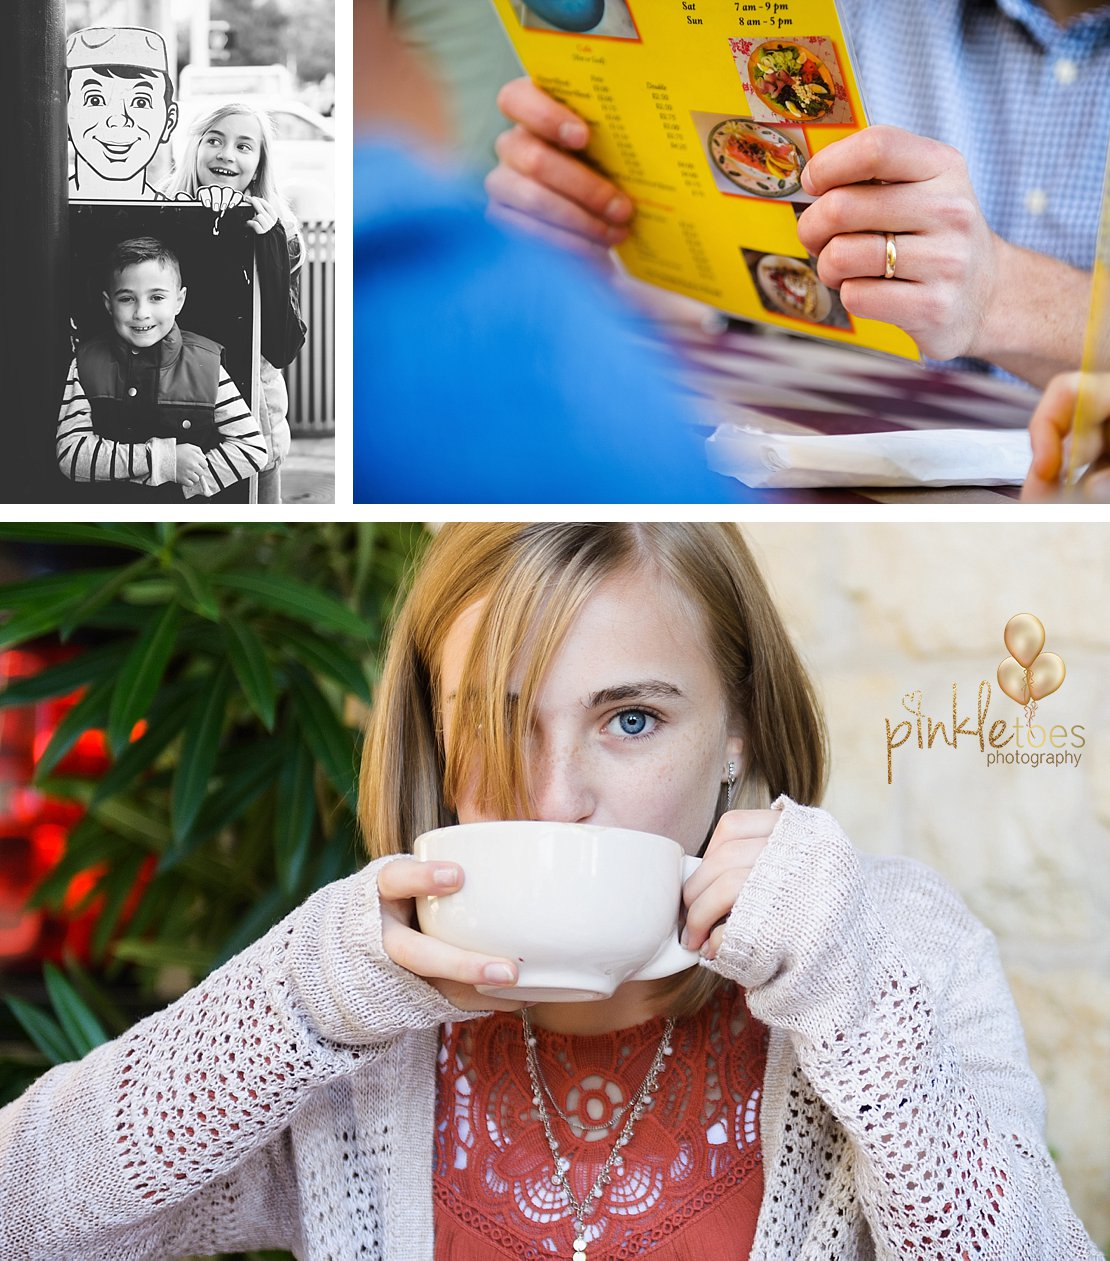 austin-urban-family-candid-photographer-016